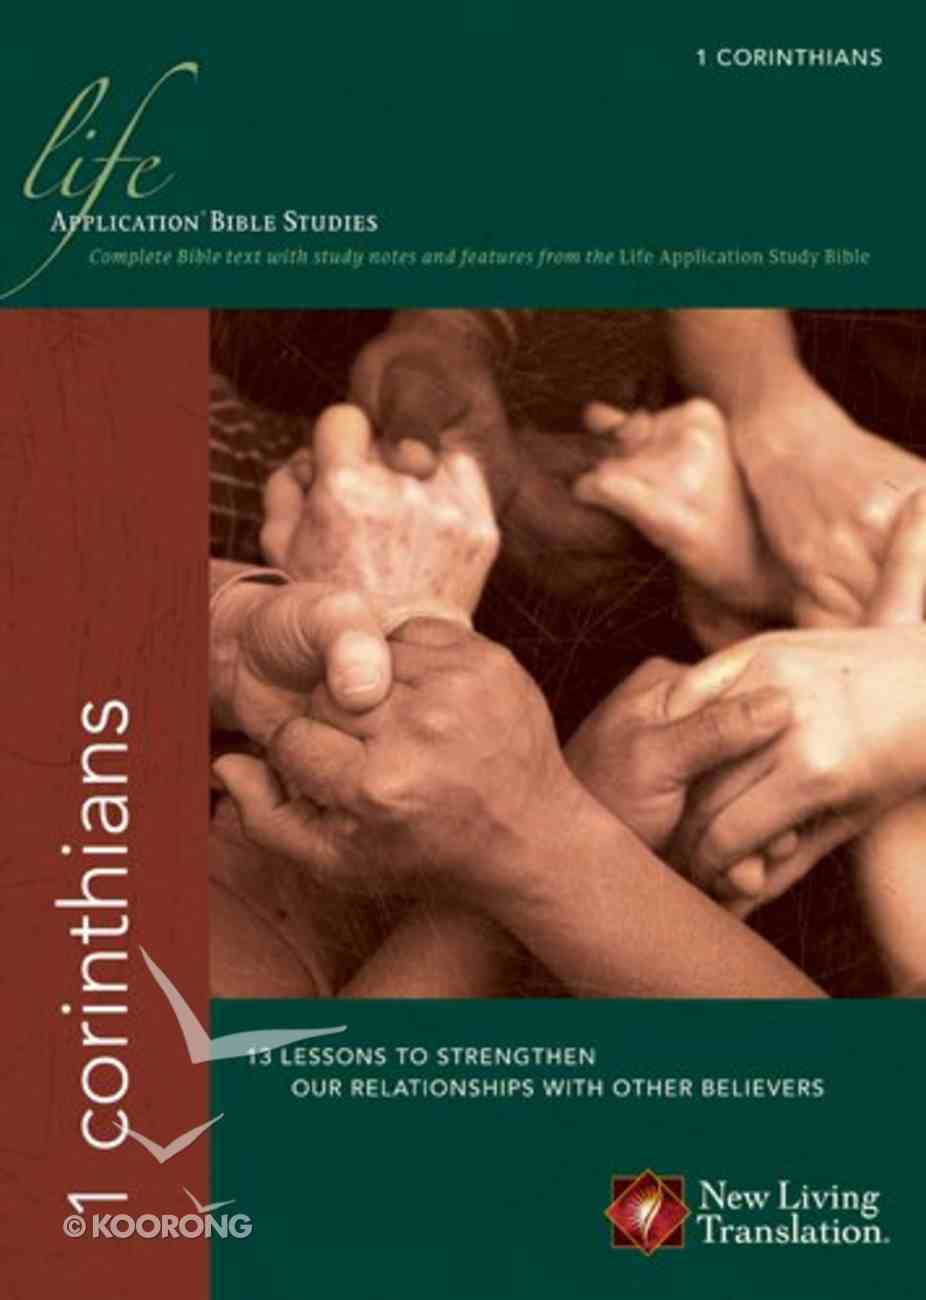 1 Corinthians (Life Application Bible Study Series) Paperback